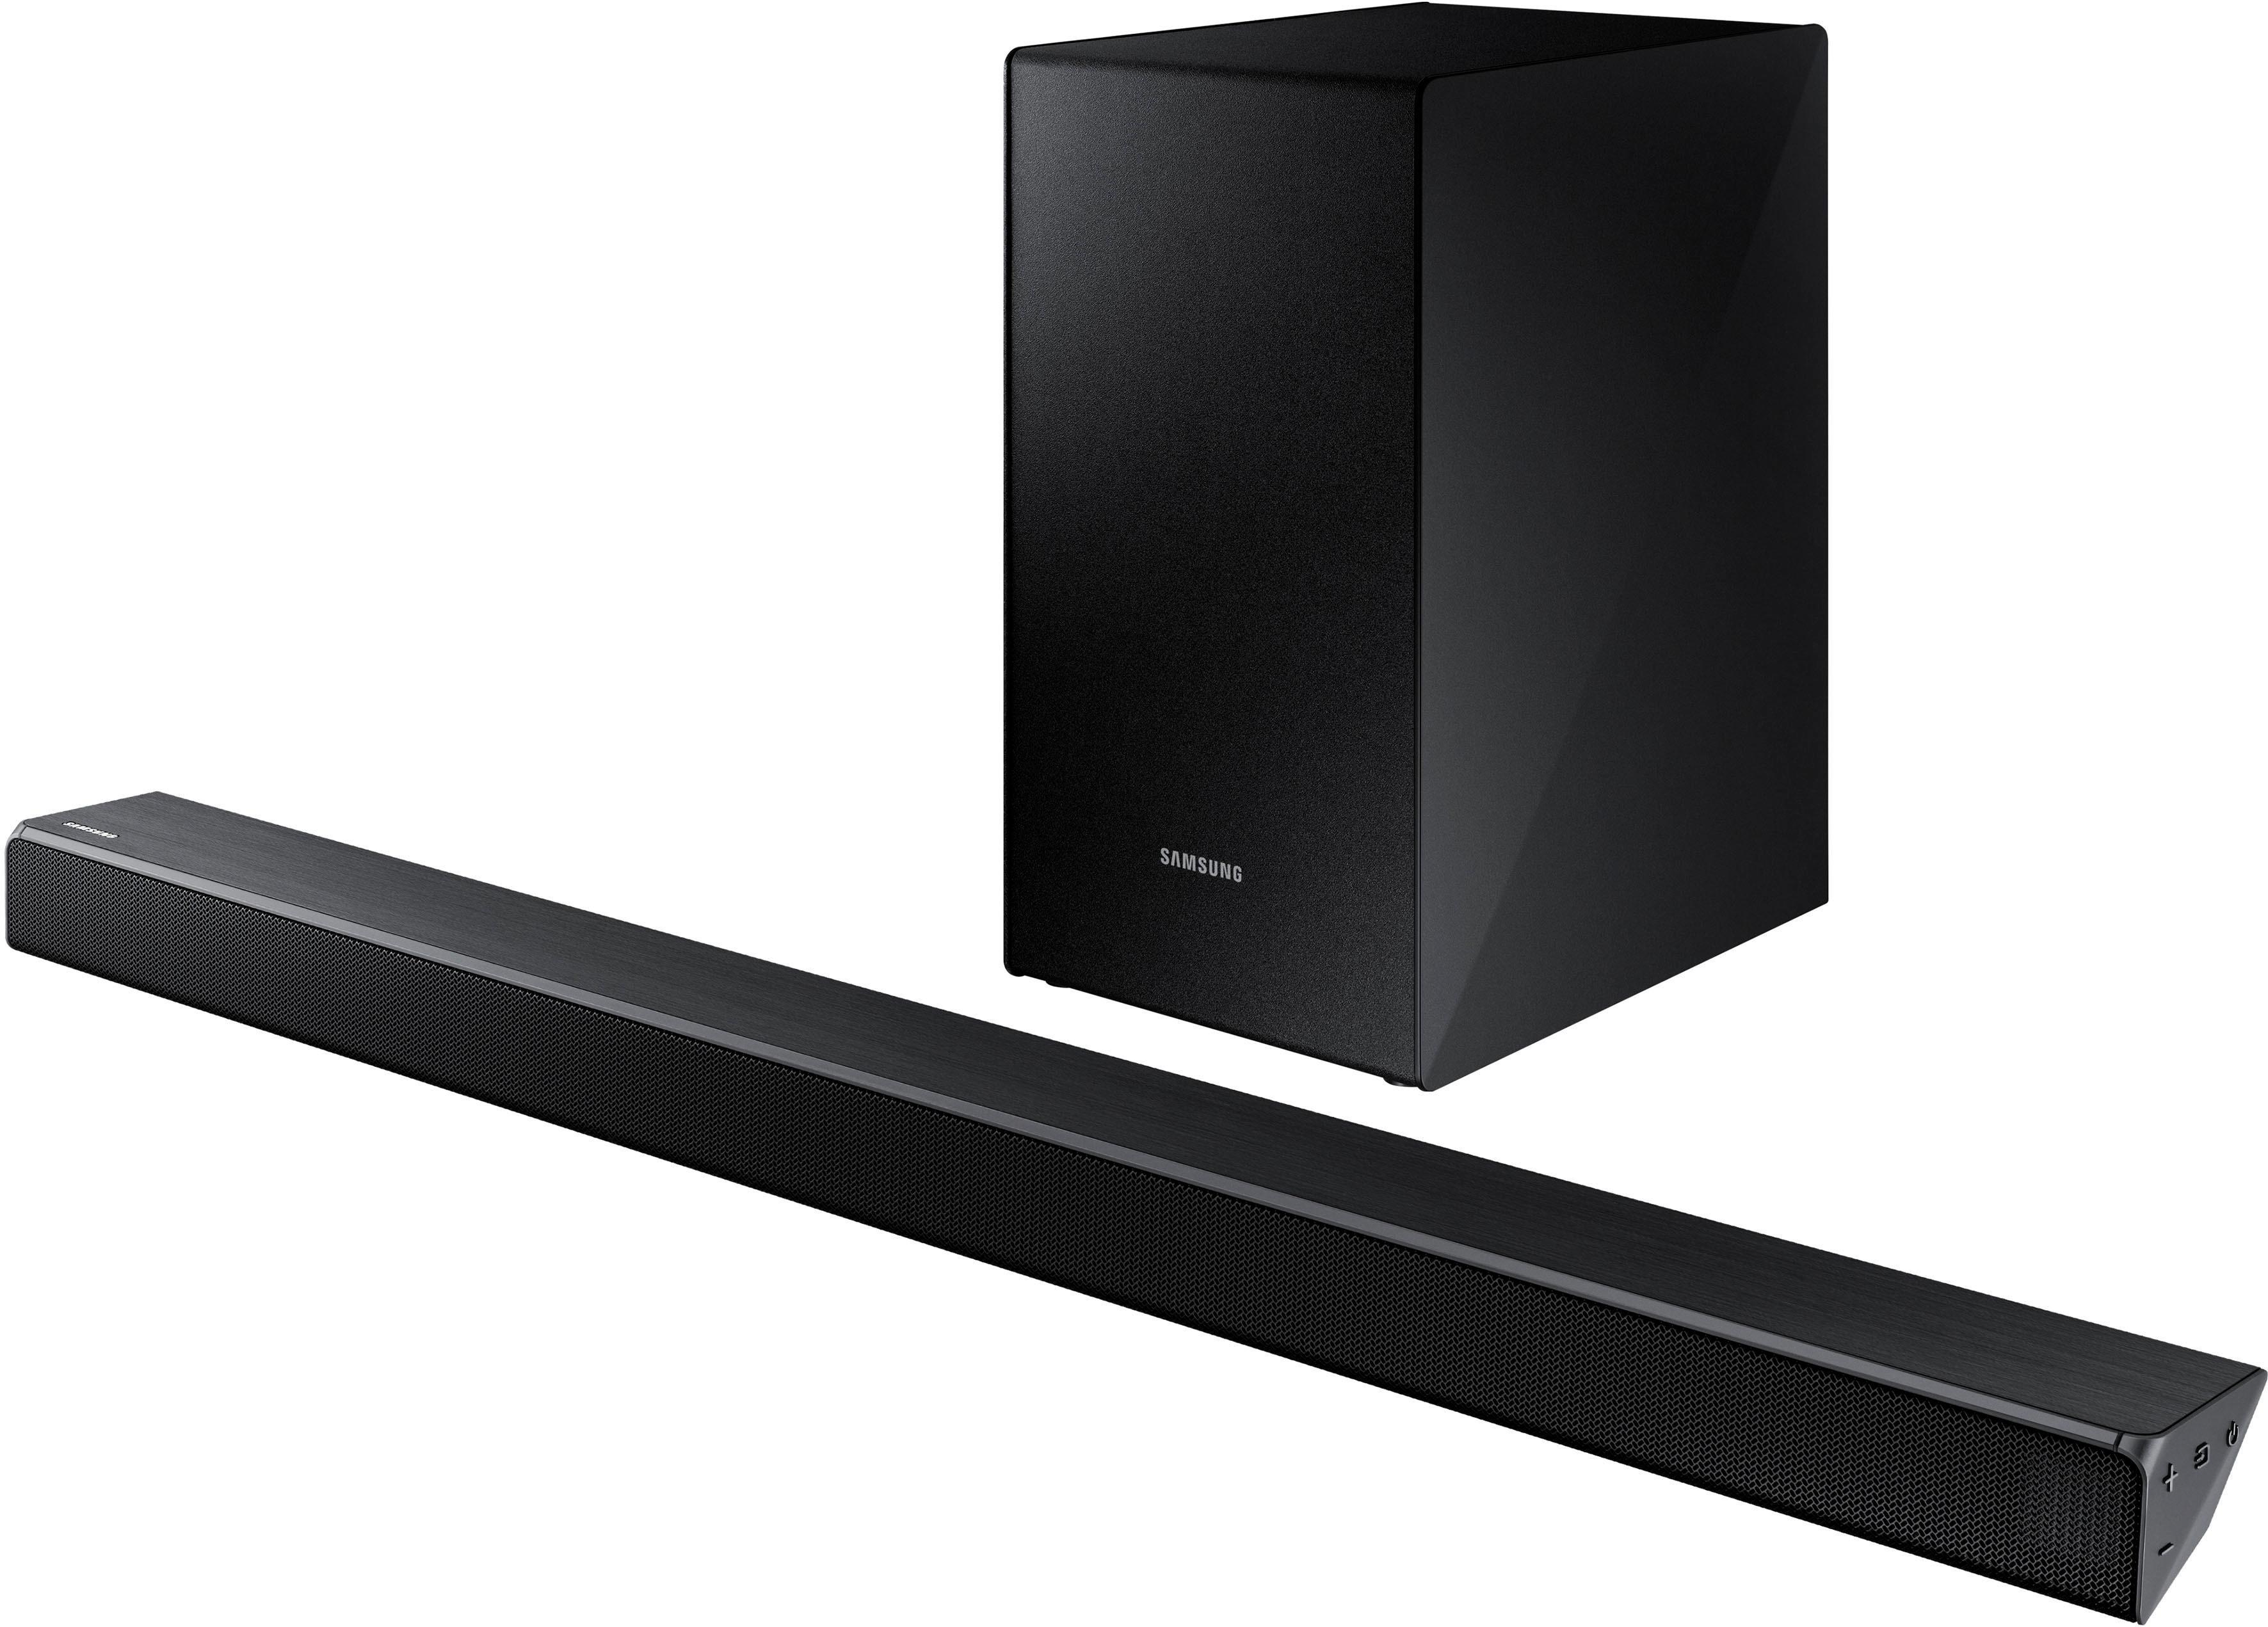 SAMSUNG »HW-N450/ZG« 2.1 Soundbar (bluetooth, 320 W) in de webshop van OTTO kopen